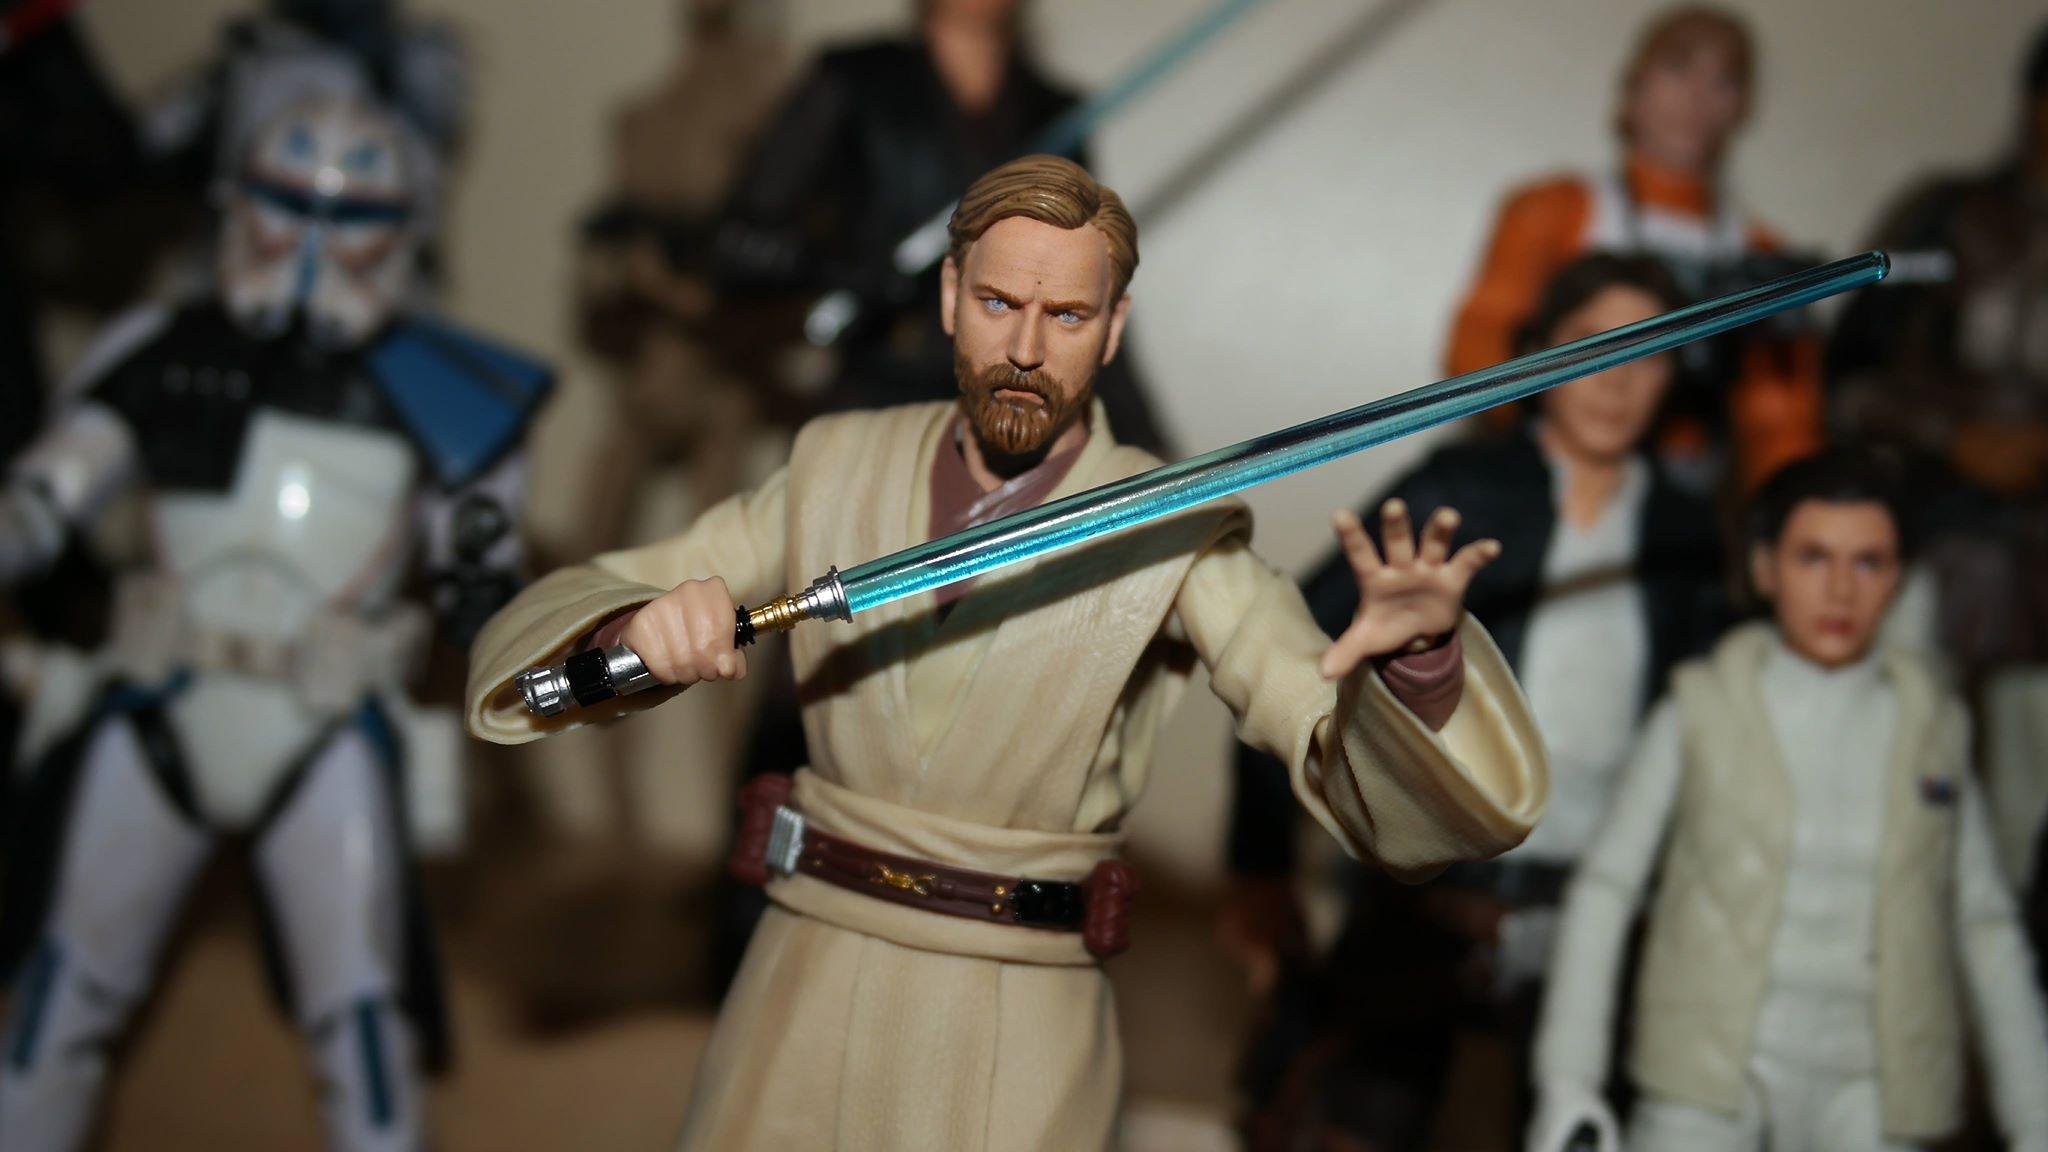 S H Figuarts Obi Wan Kenobi Review 8 Future Of The Force